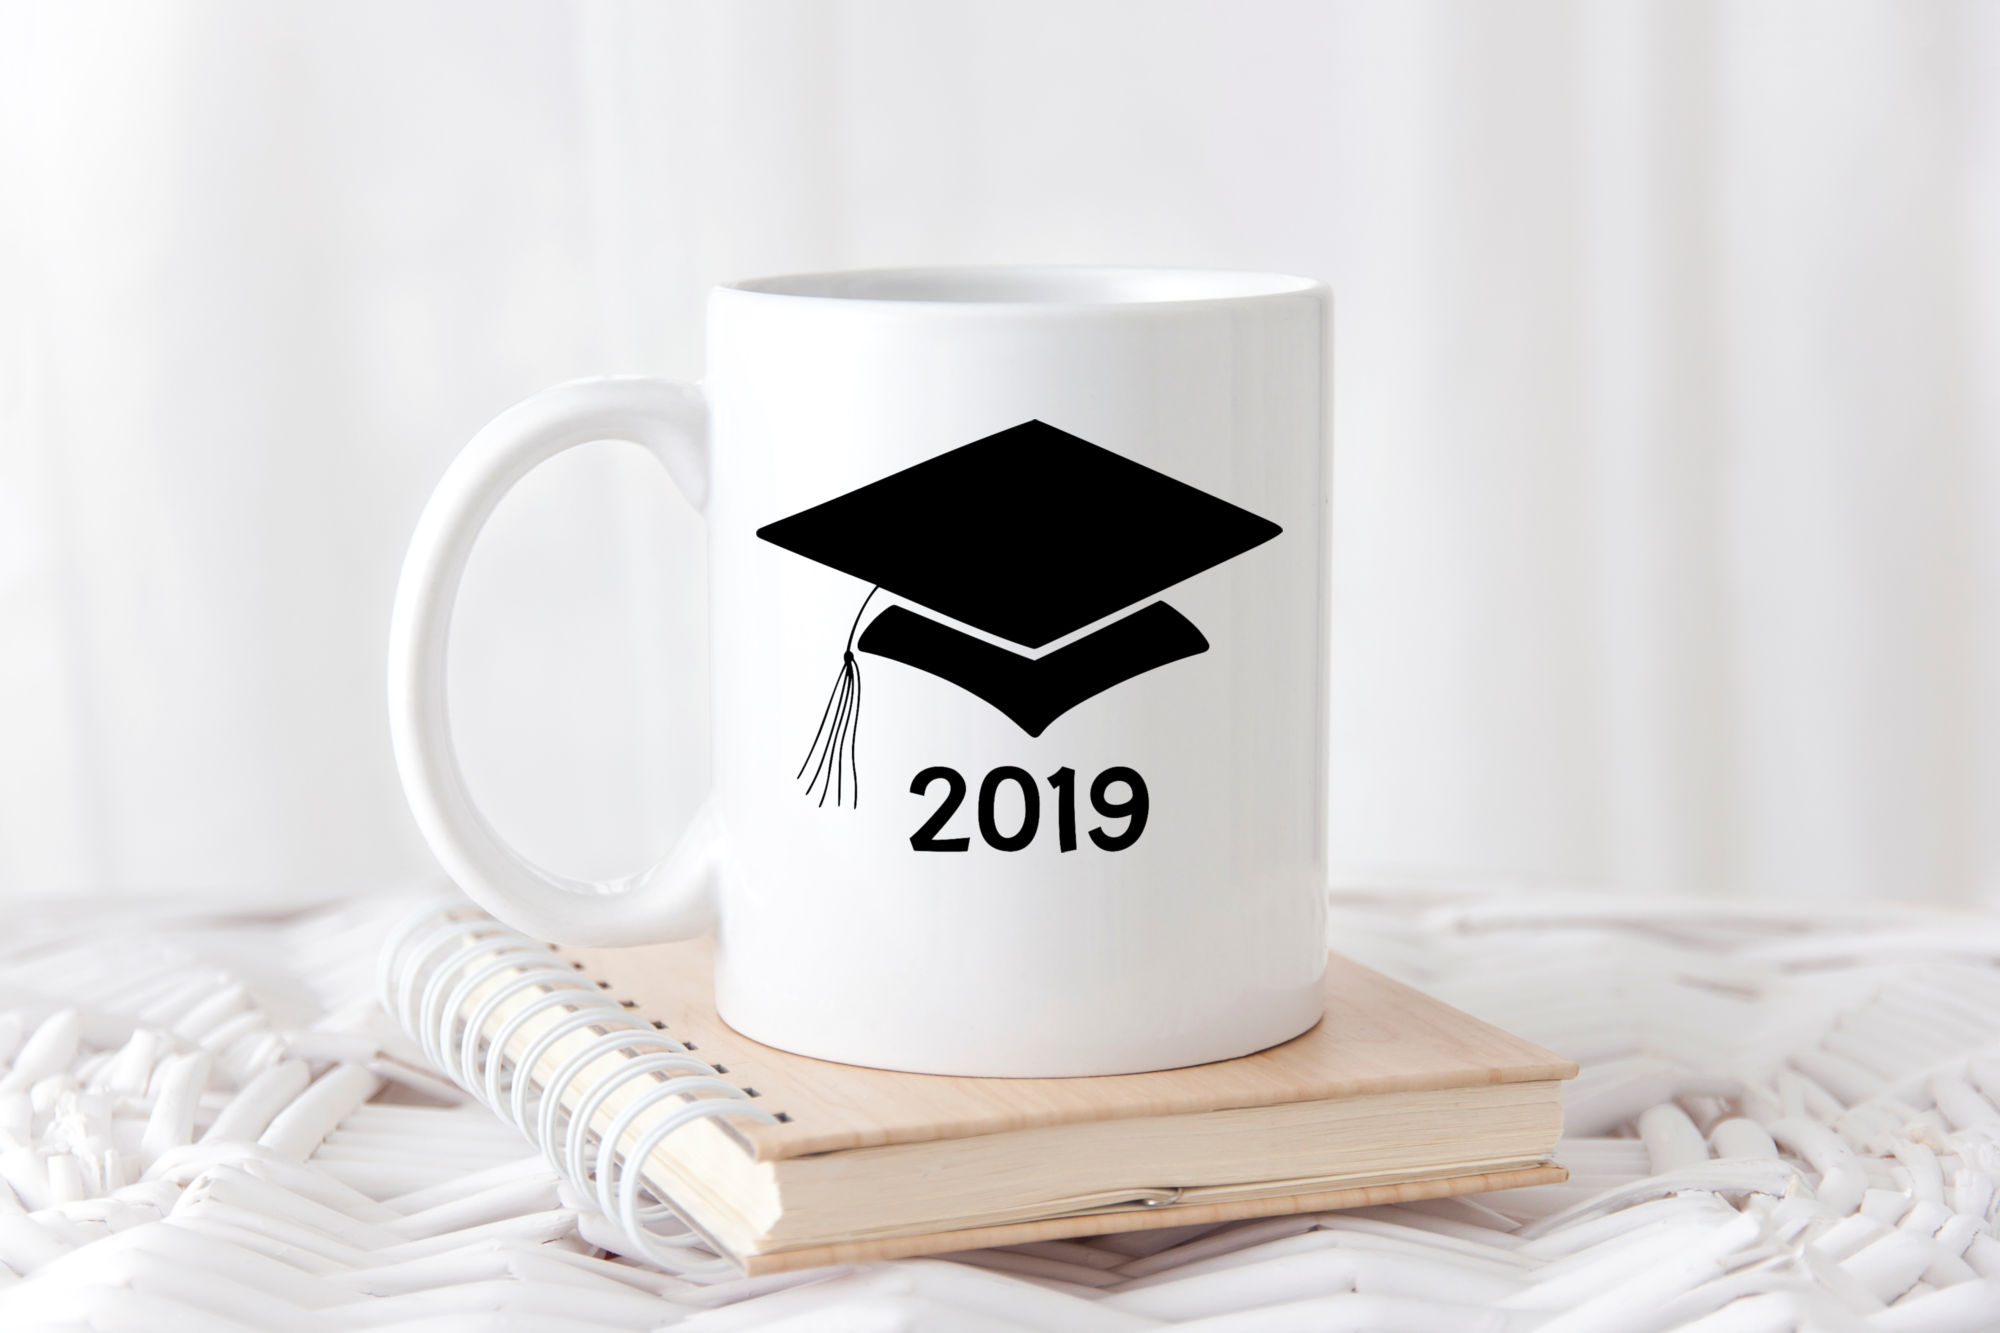 Graduation SVG Bundle - Includes 6 Class of 2019 SVG files example image 4